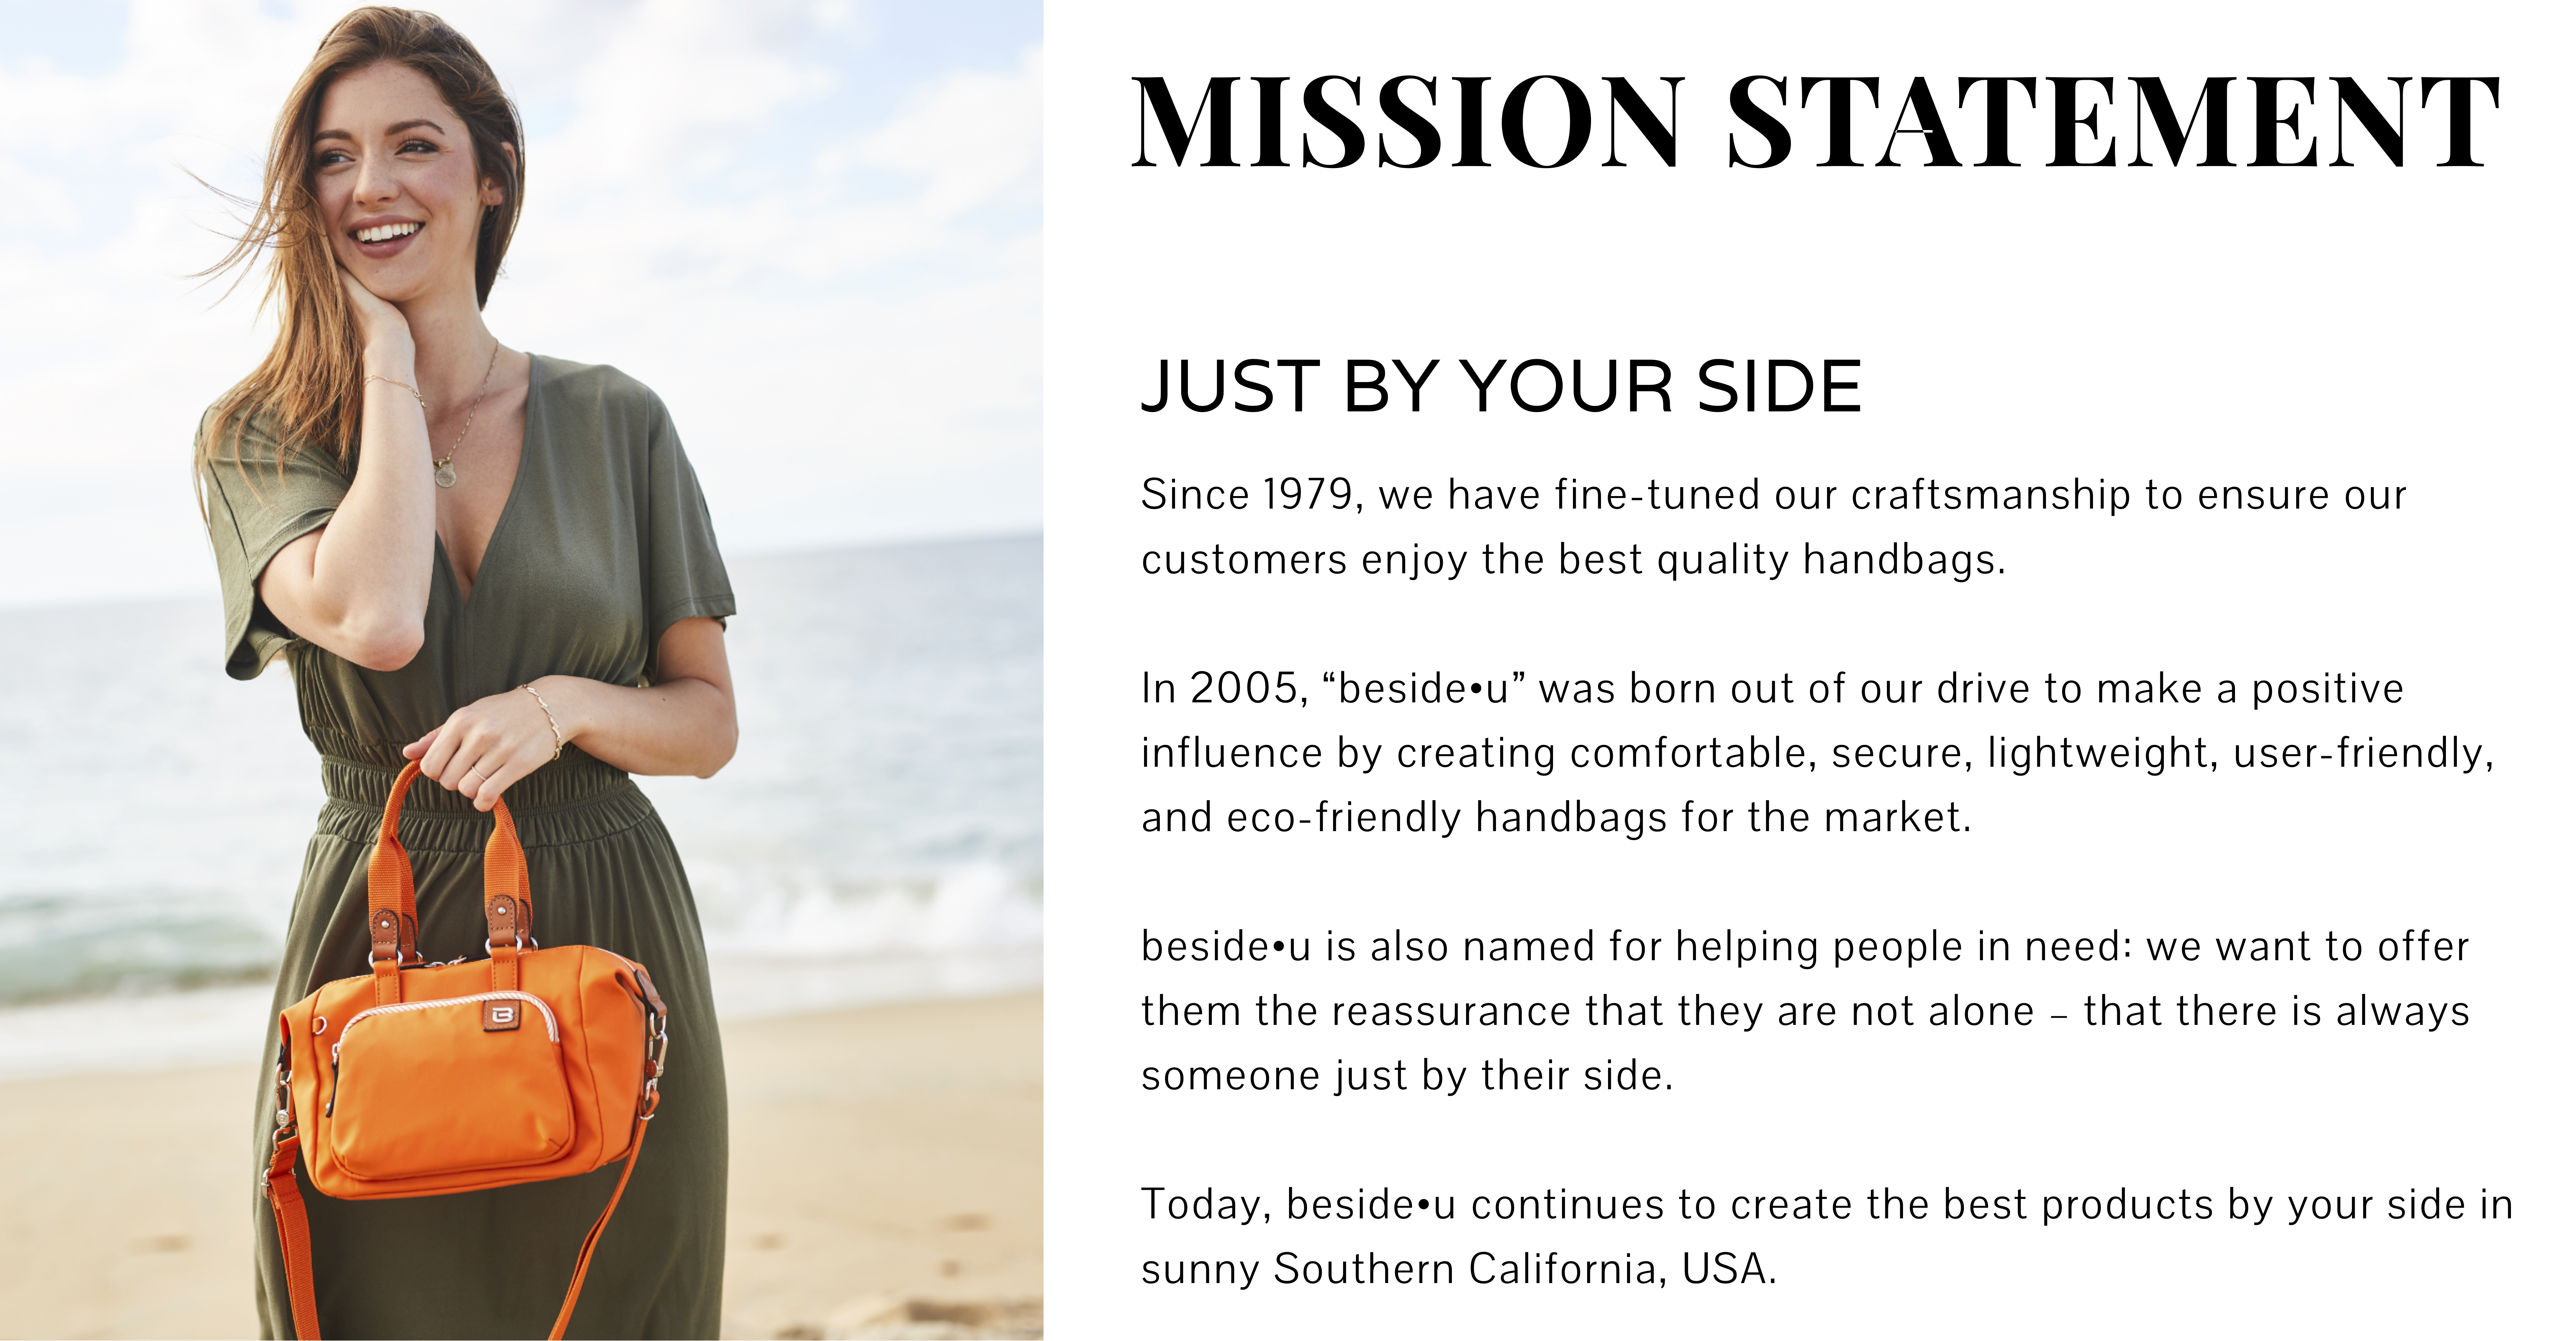 copy-of-mission-statement-hq.jpg